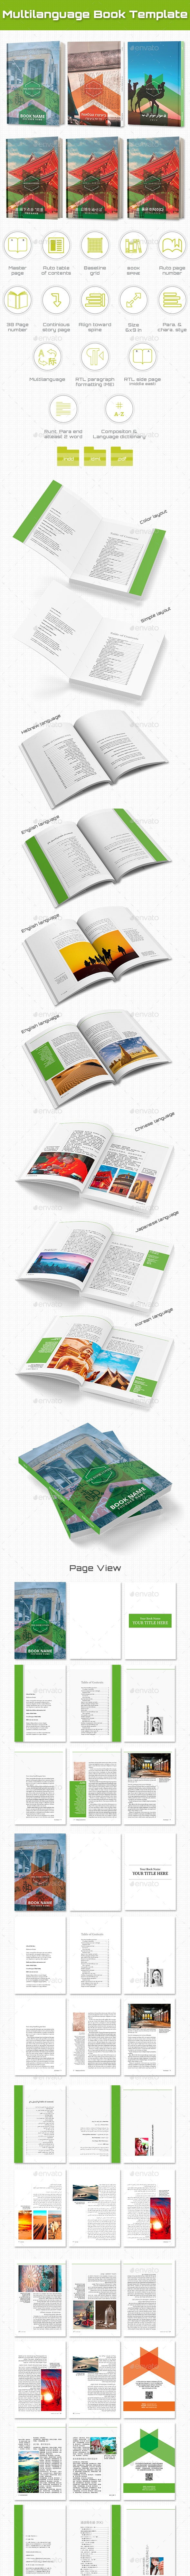 Indesign Multilanguage Book Template - Miscellaneous Print Templates